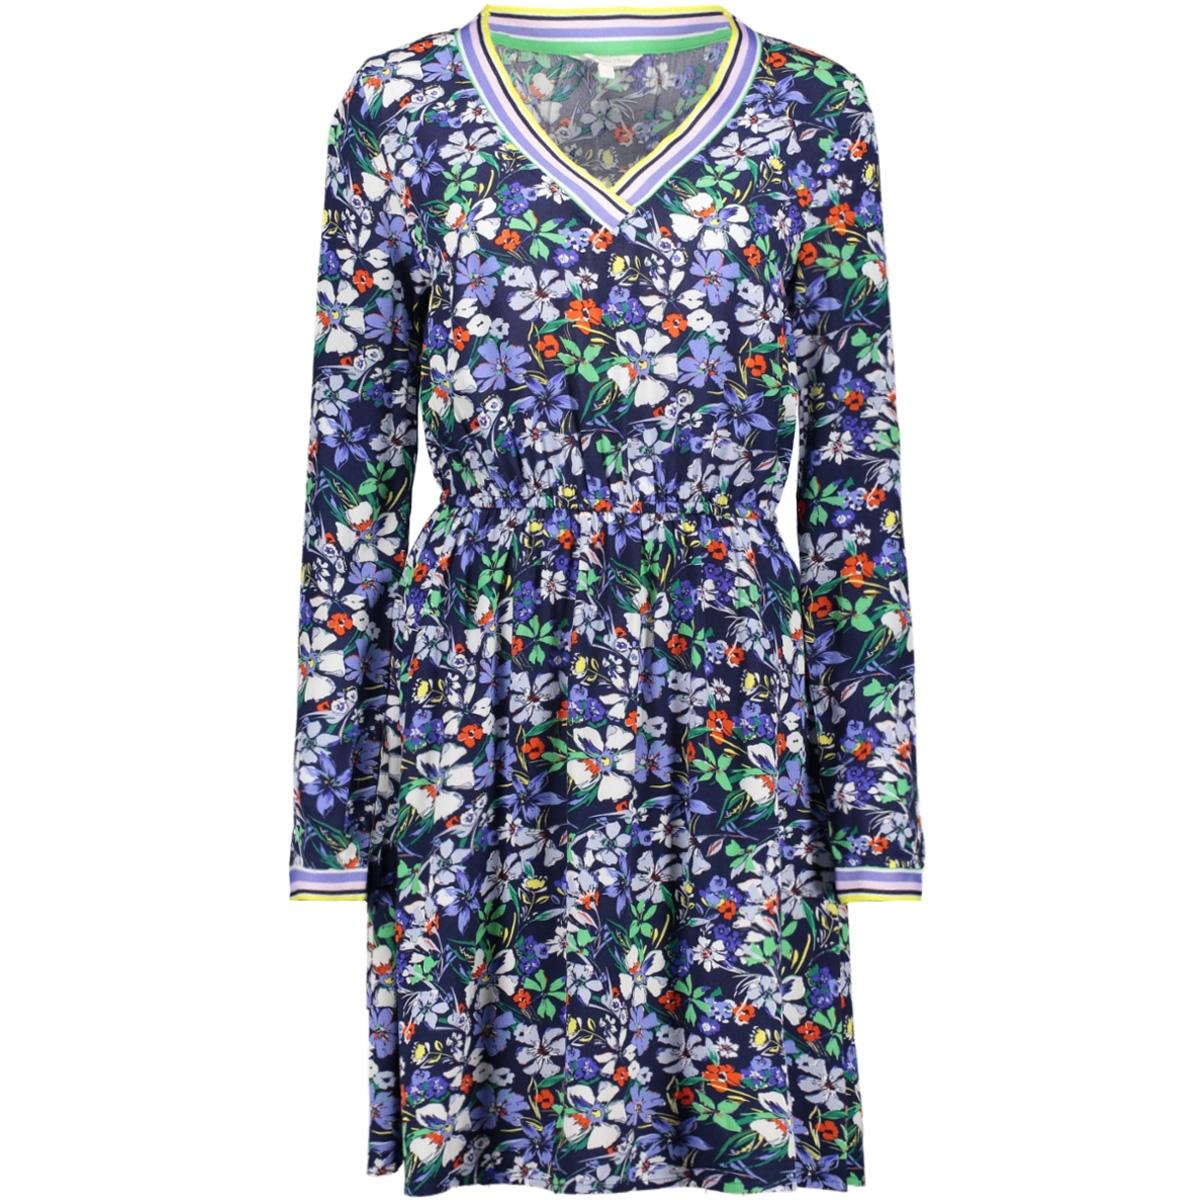 1009880xx71 tom tailor jurk 15874